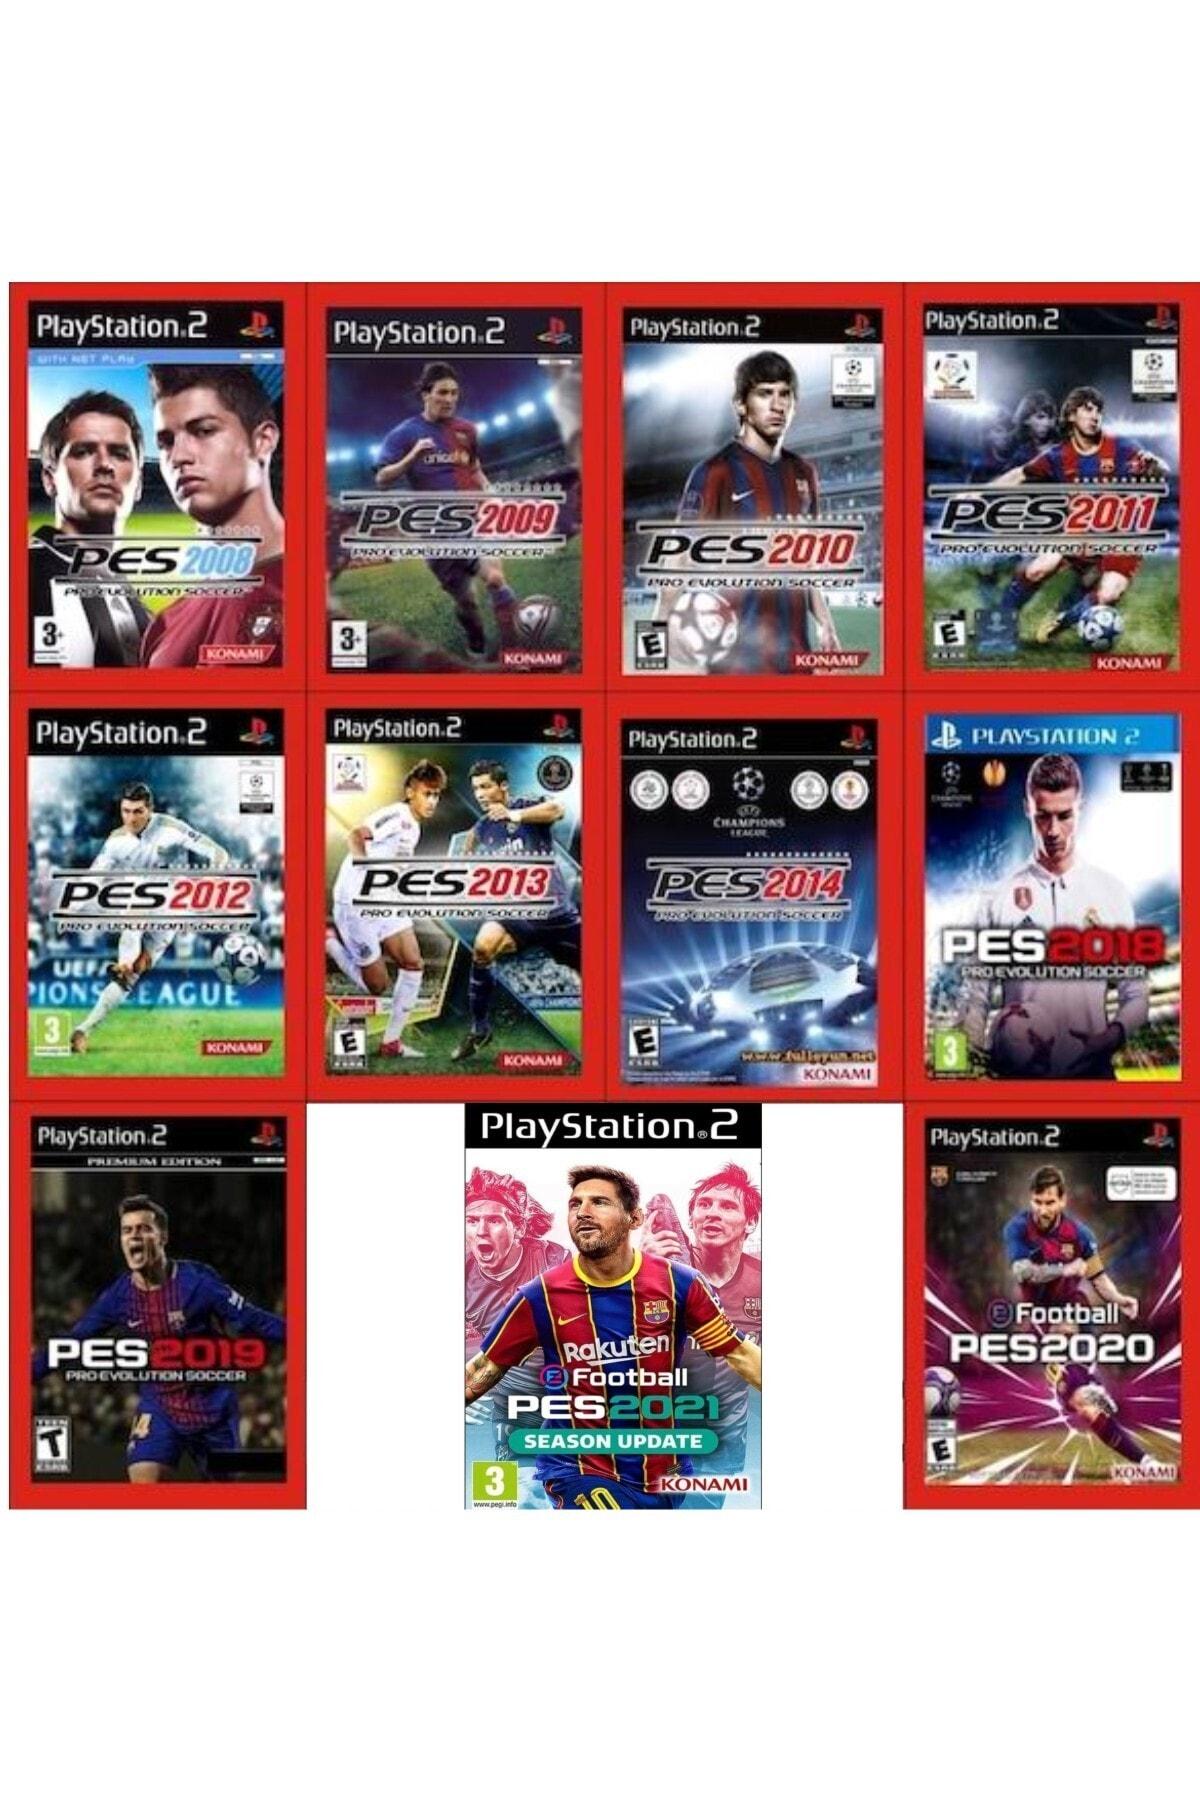 Sony Playstatıon 2 - Pes Serisi 11oyun 1